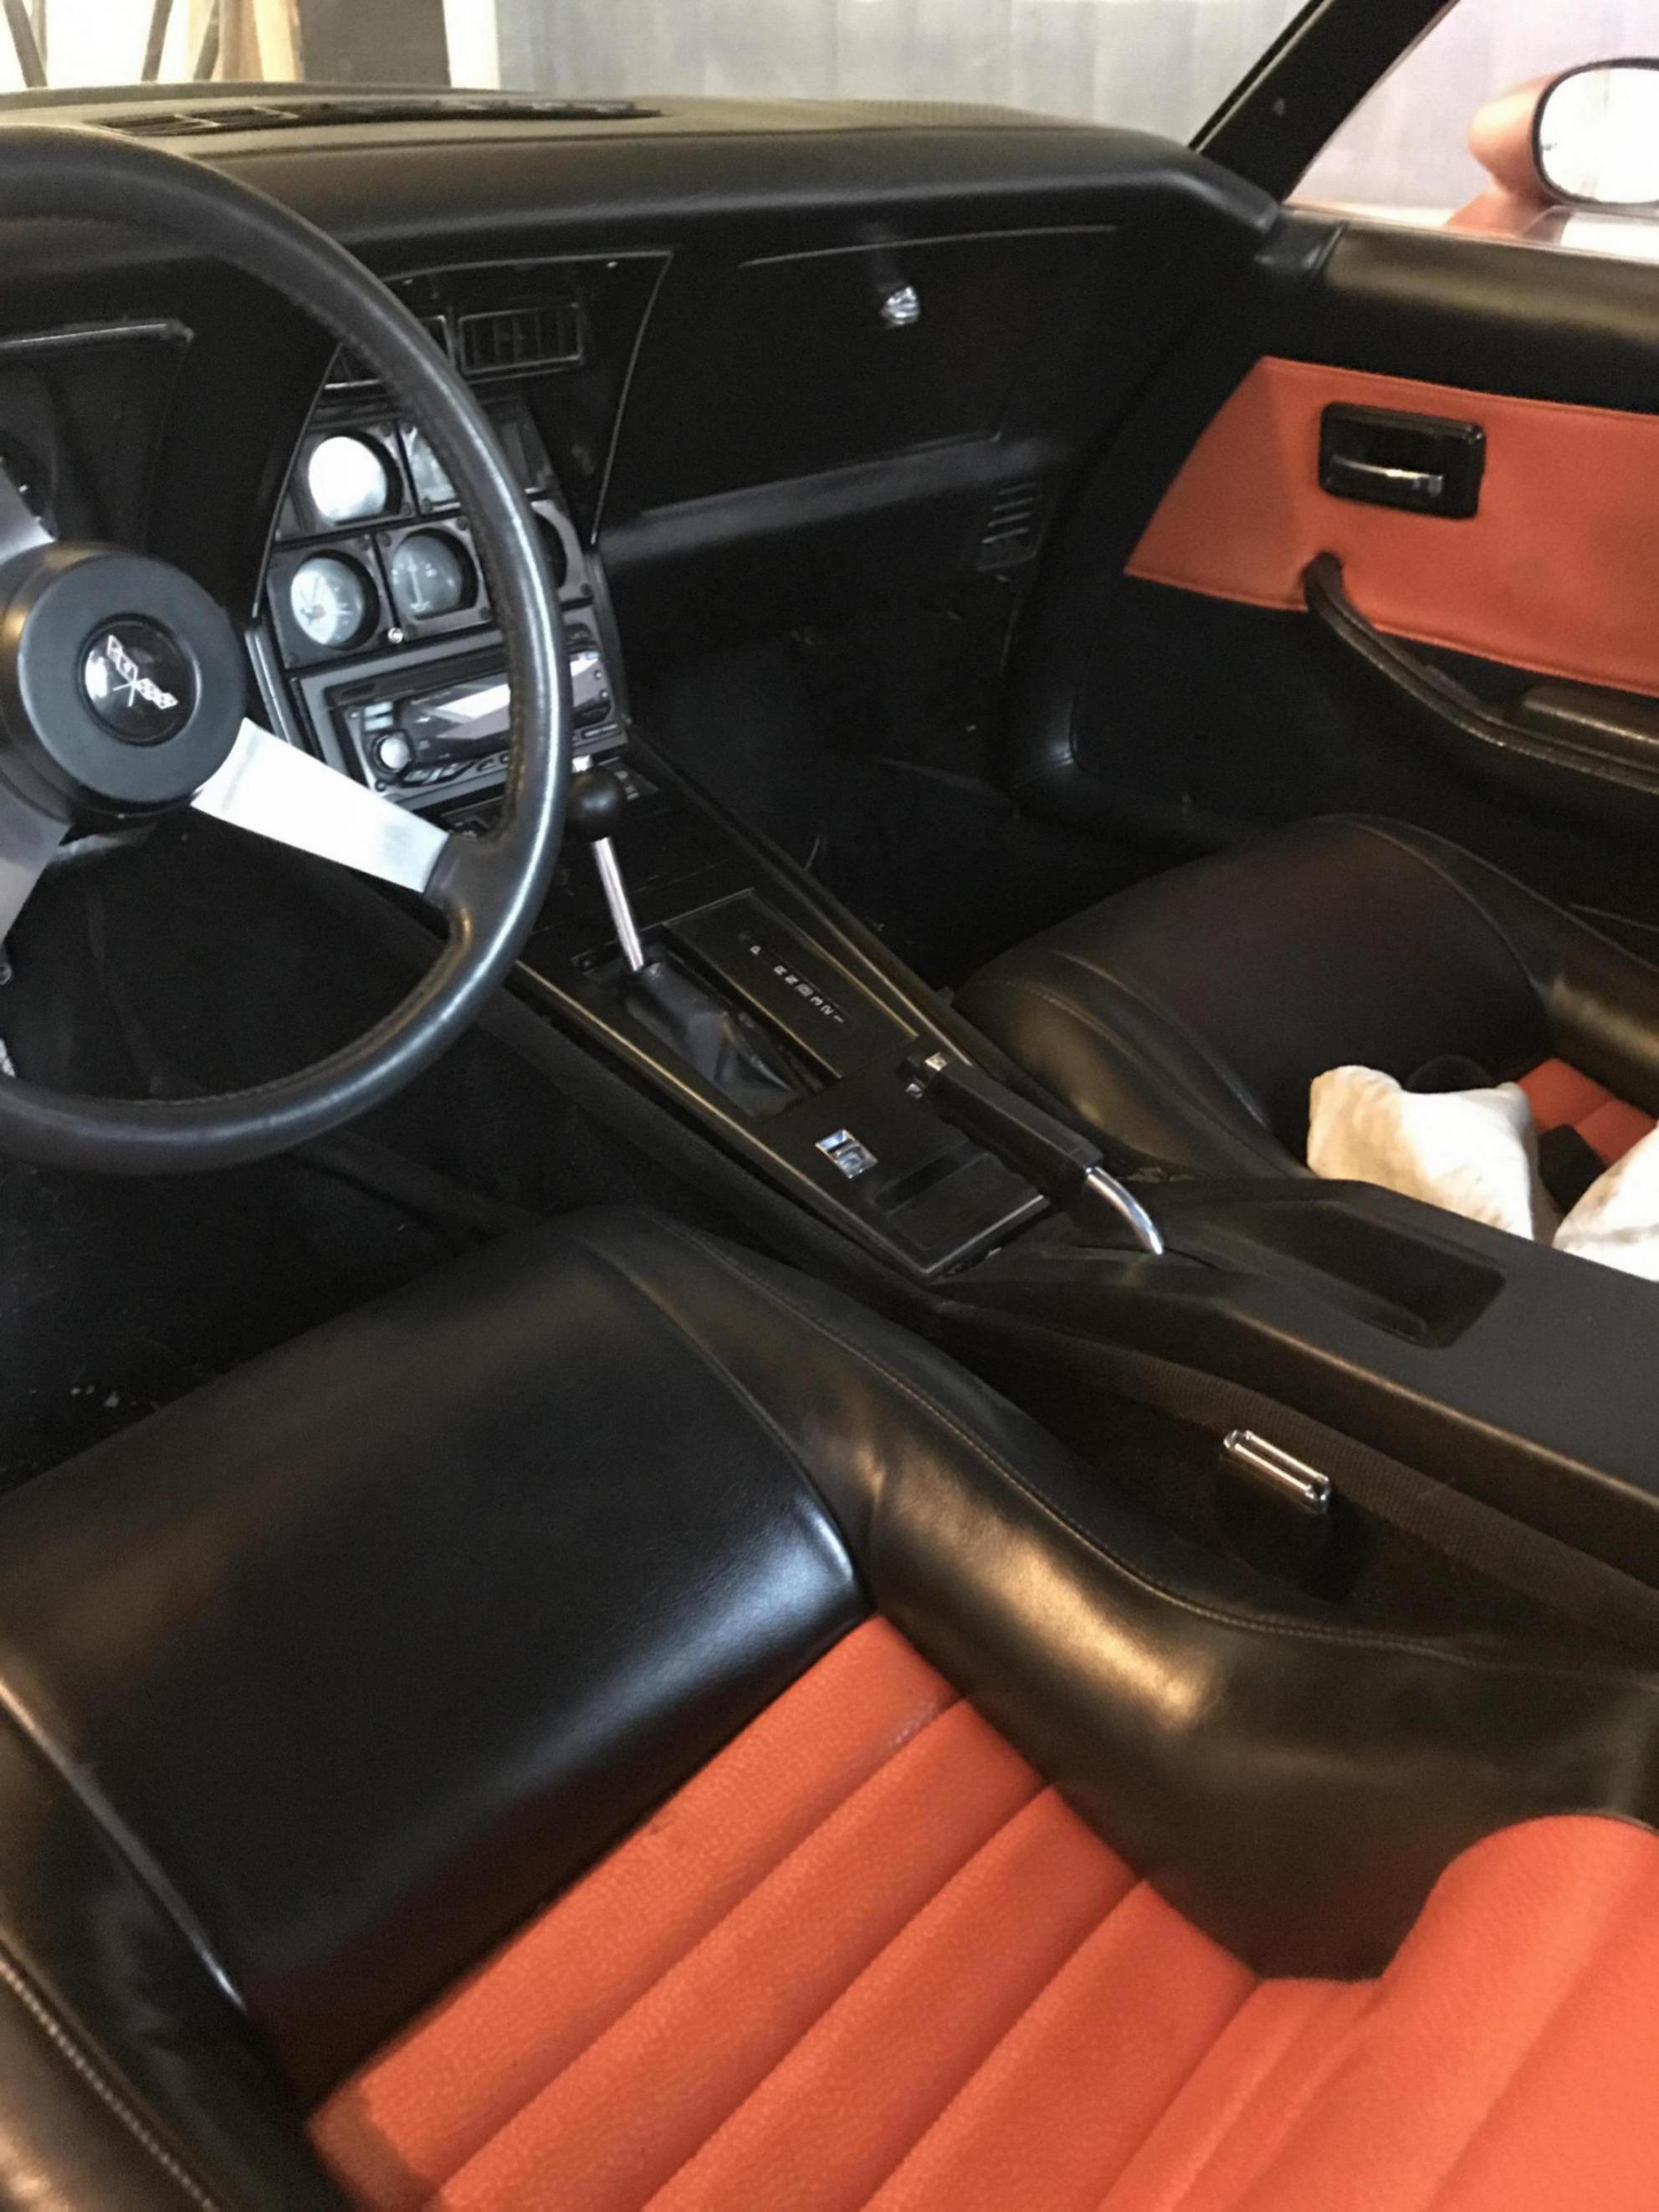 Should I trade my 1098 for a 79 Corvette? - Ducati.ms - The Ultimate ...